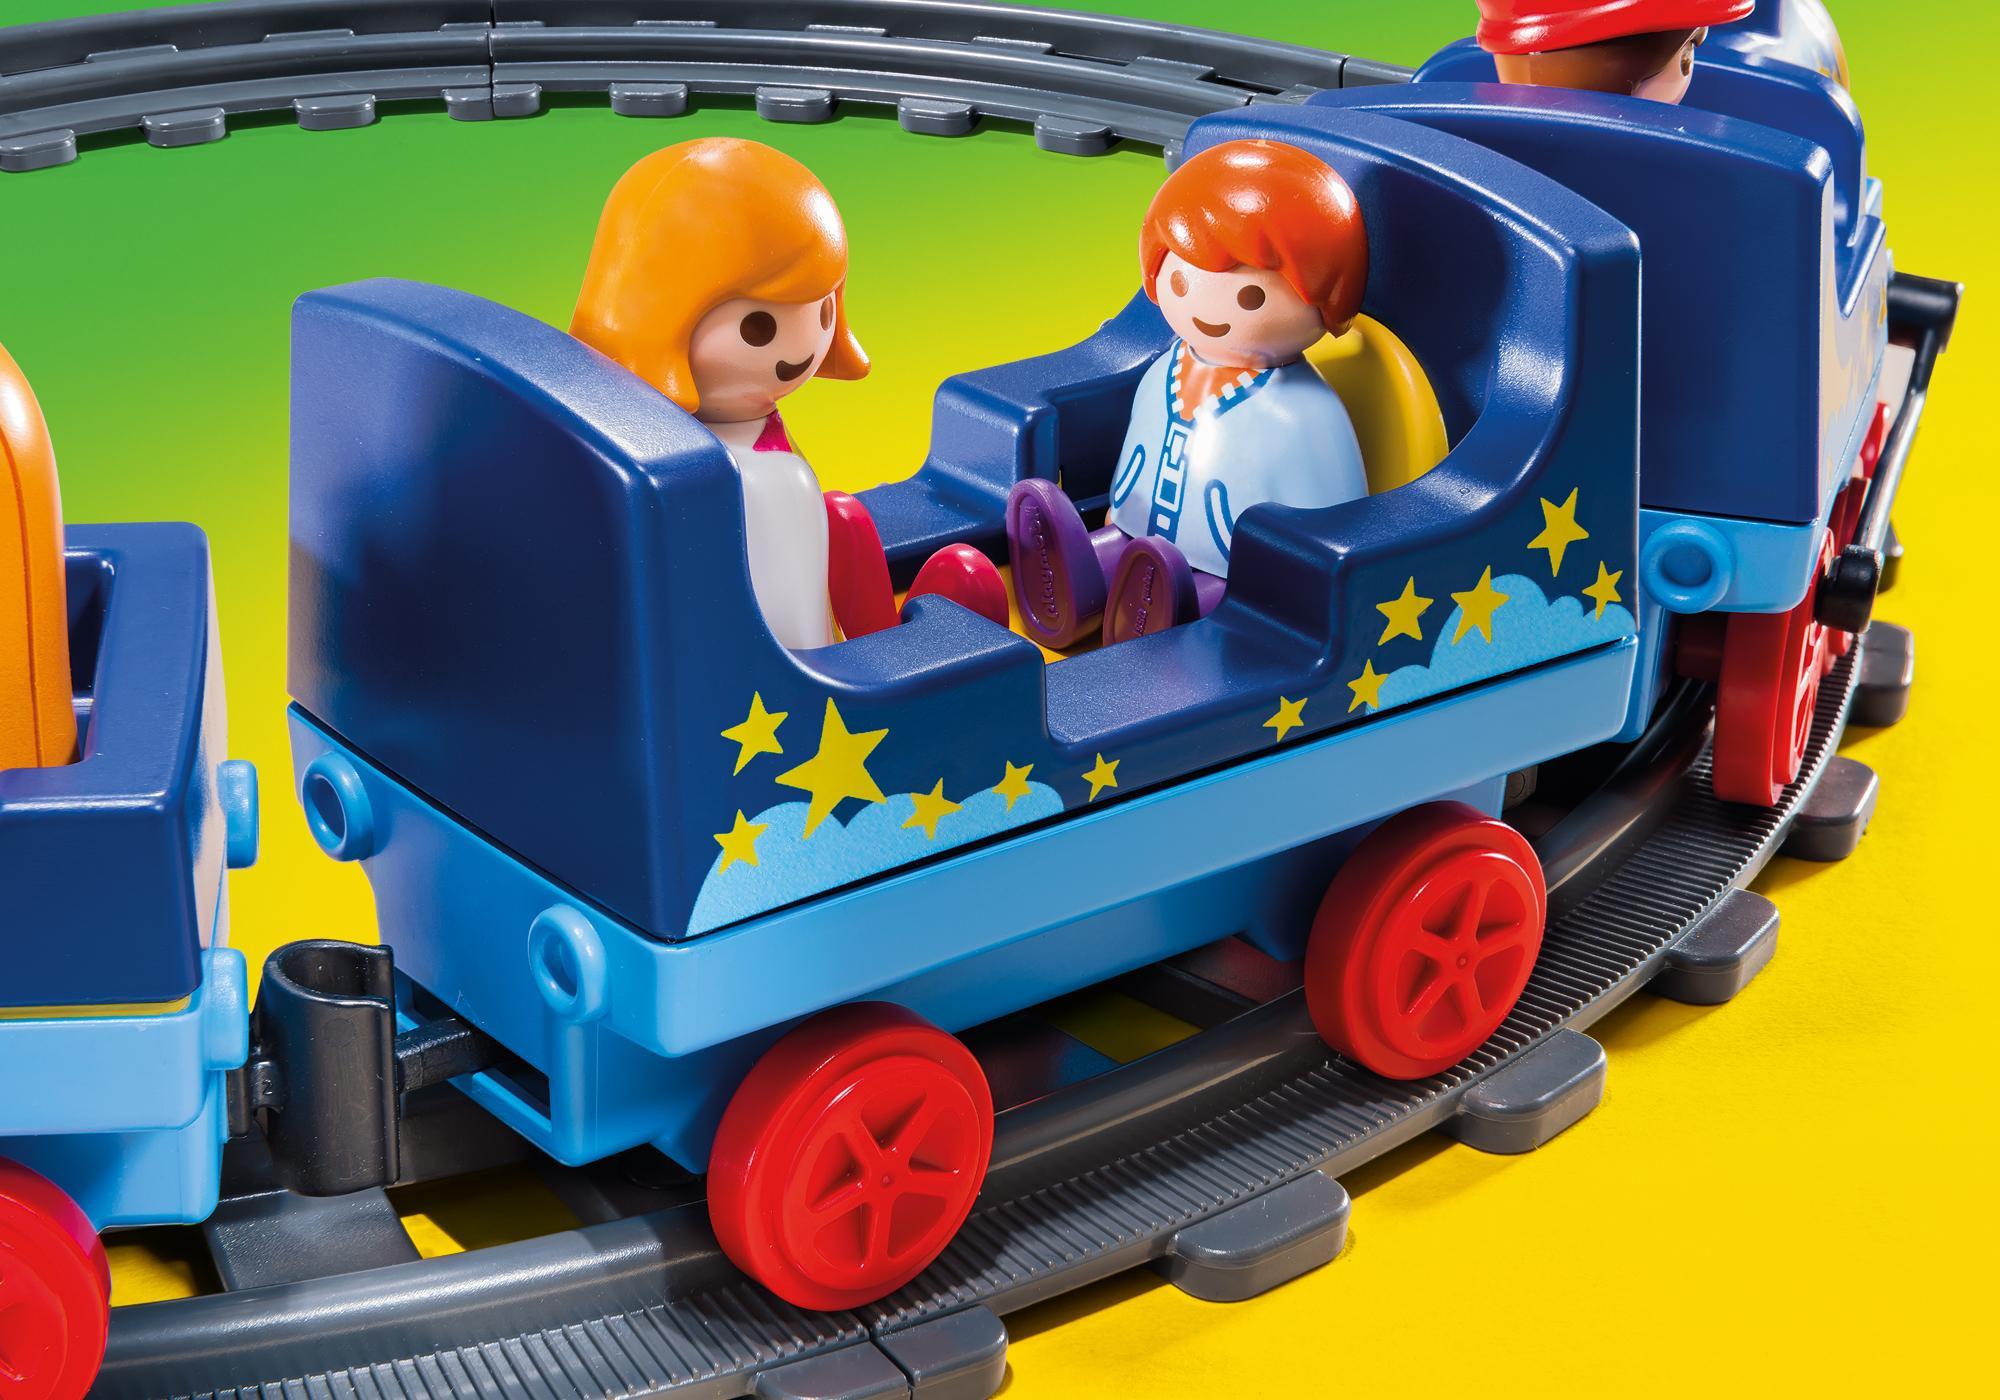 http://media.playmobil.com/i/playmobil/6880_product_extra1/1.2.3 Tren con Vías